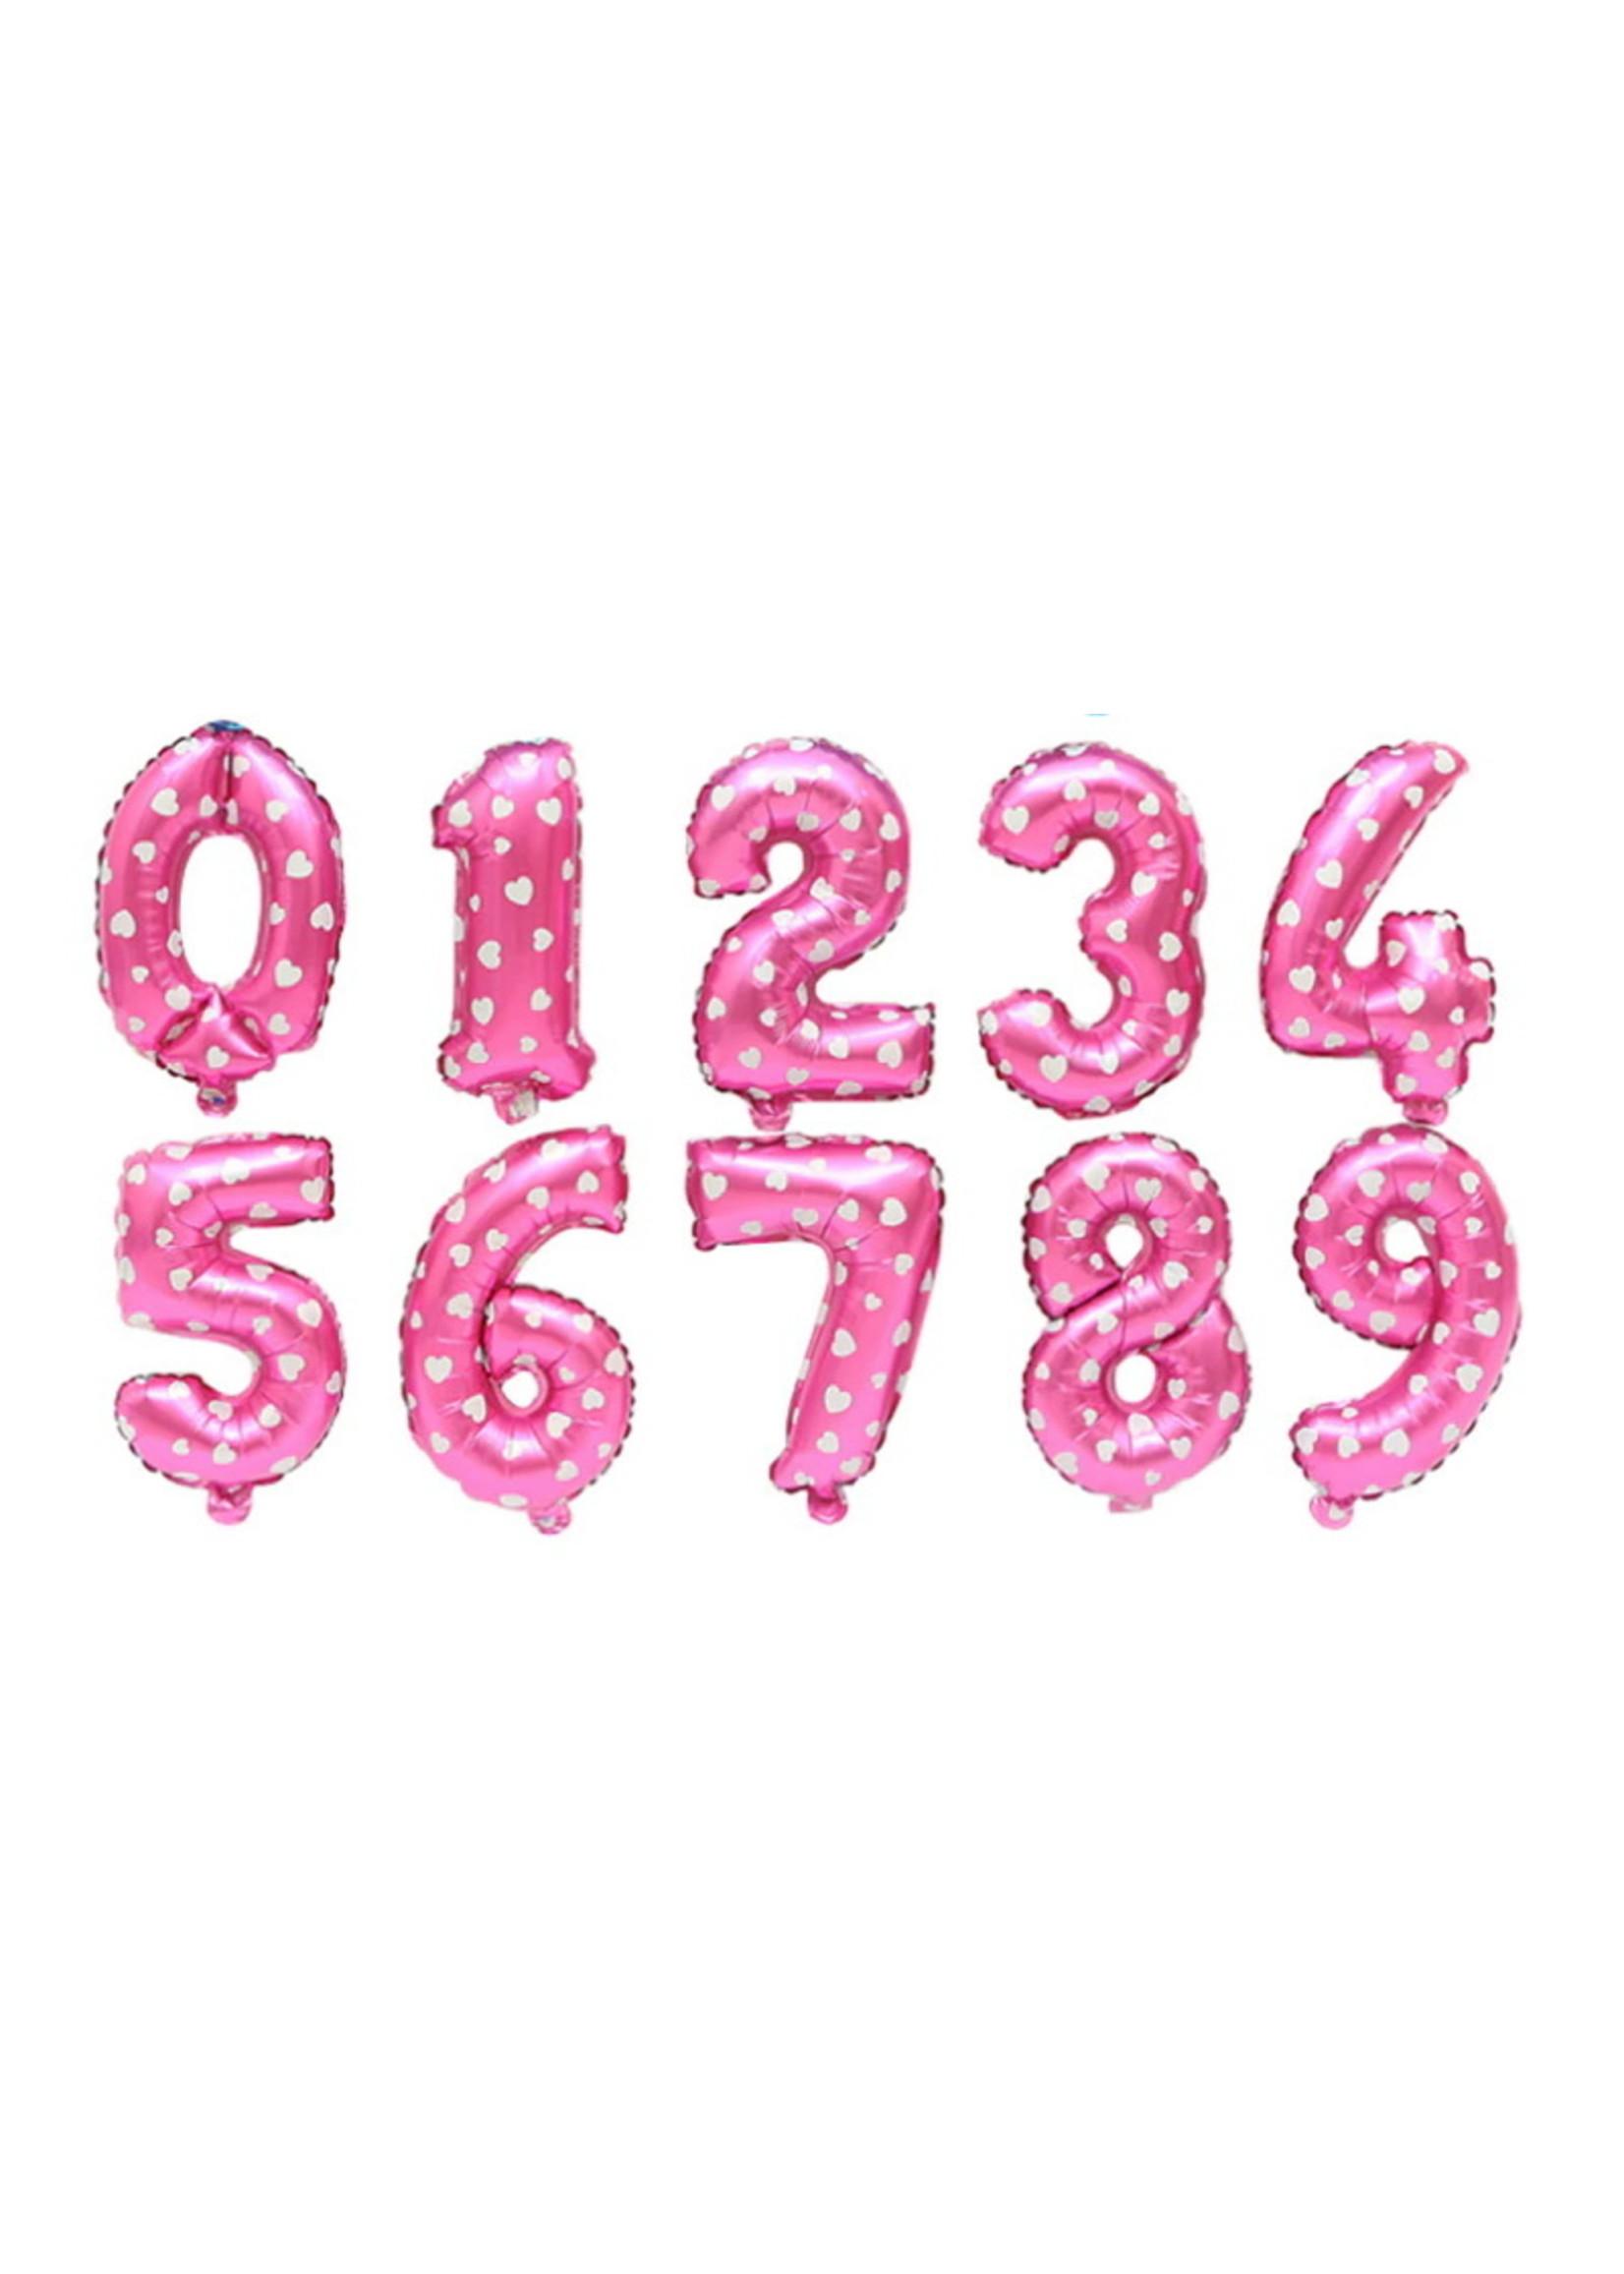 Annienas Cijfer ballon roze met hartjes